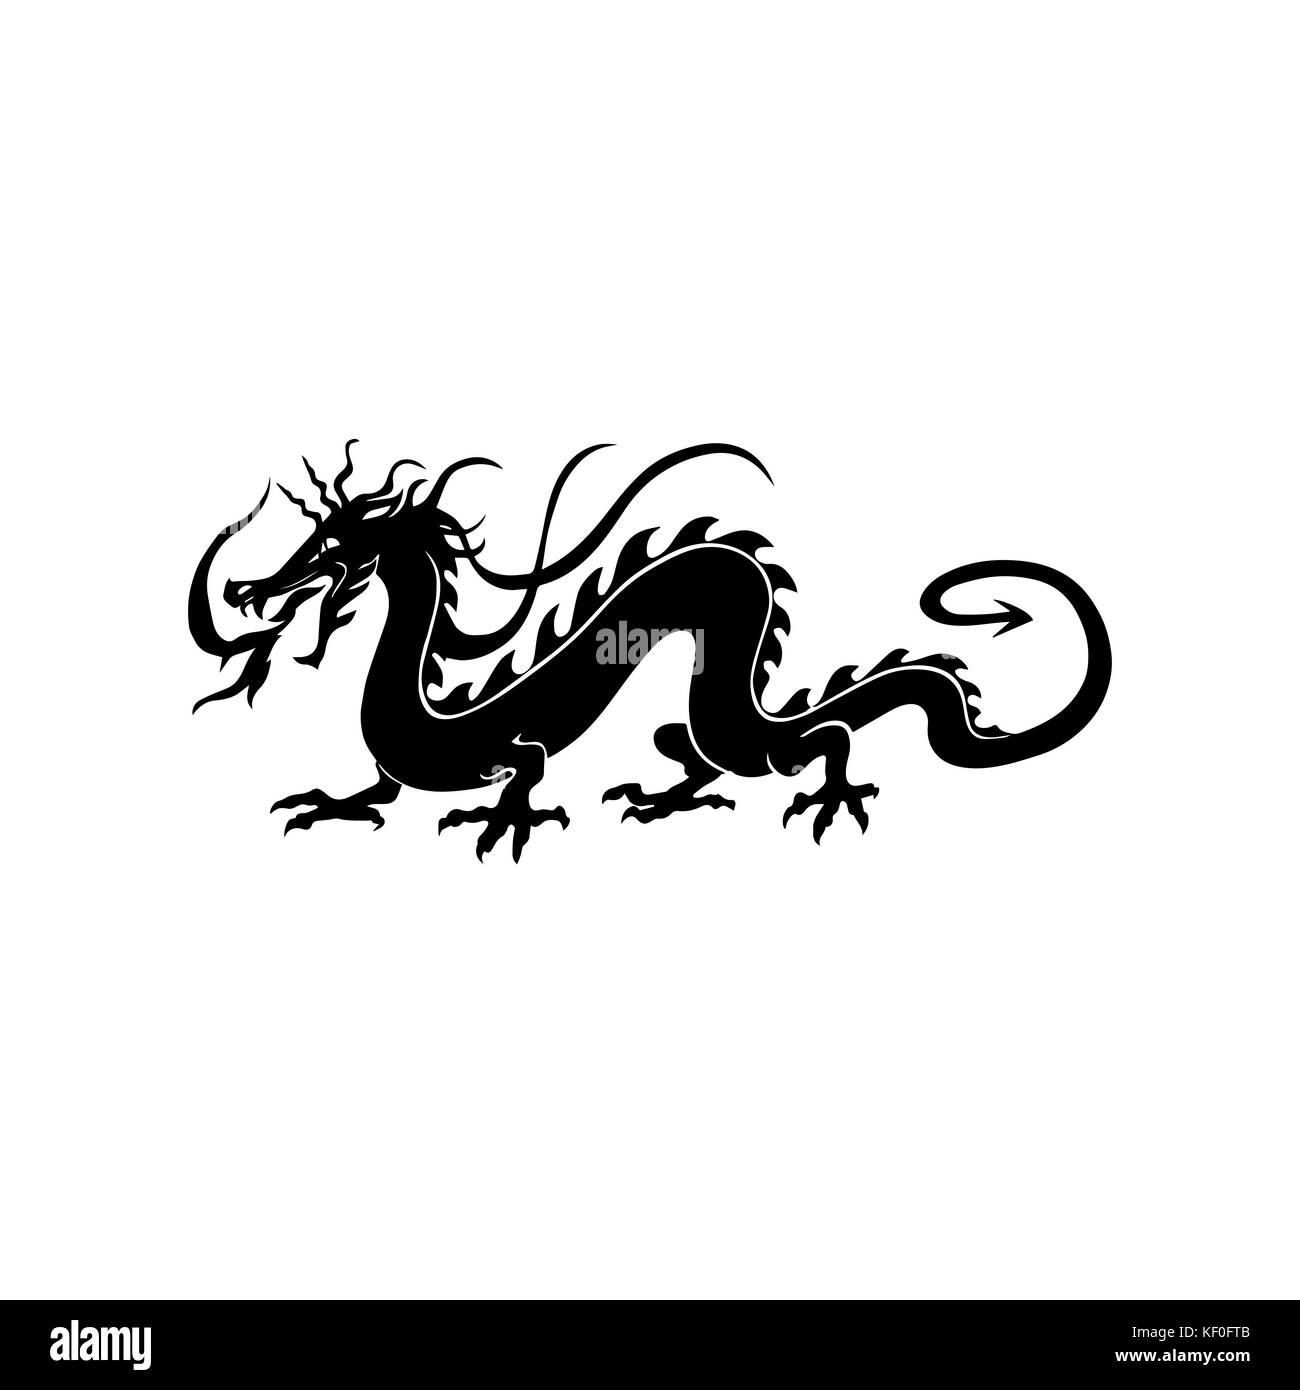 Tribal dragon tattoo stock photos tribal dragon tattoo stock chinese dragon tattoo stock image buycottarizona